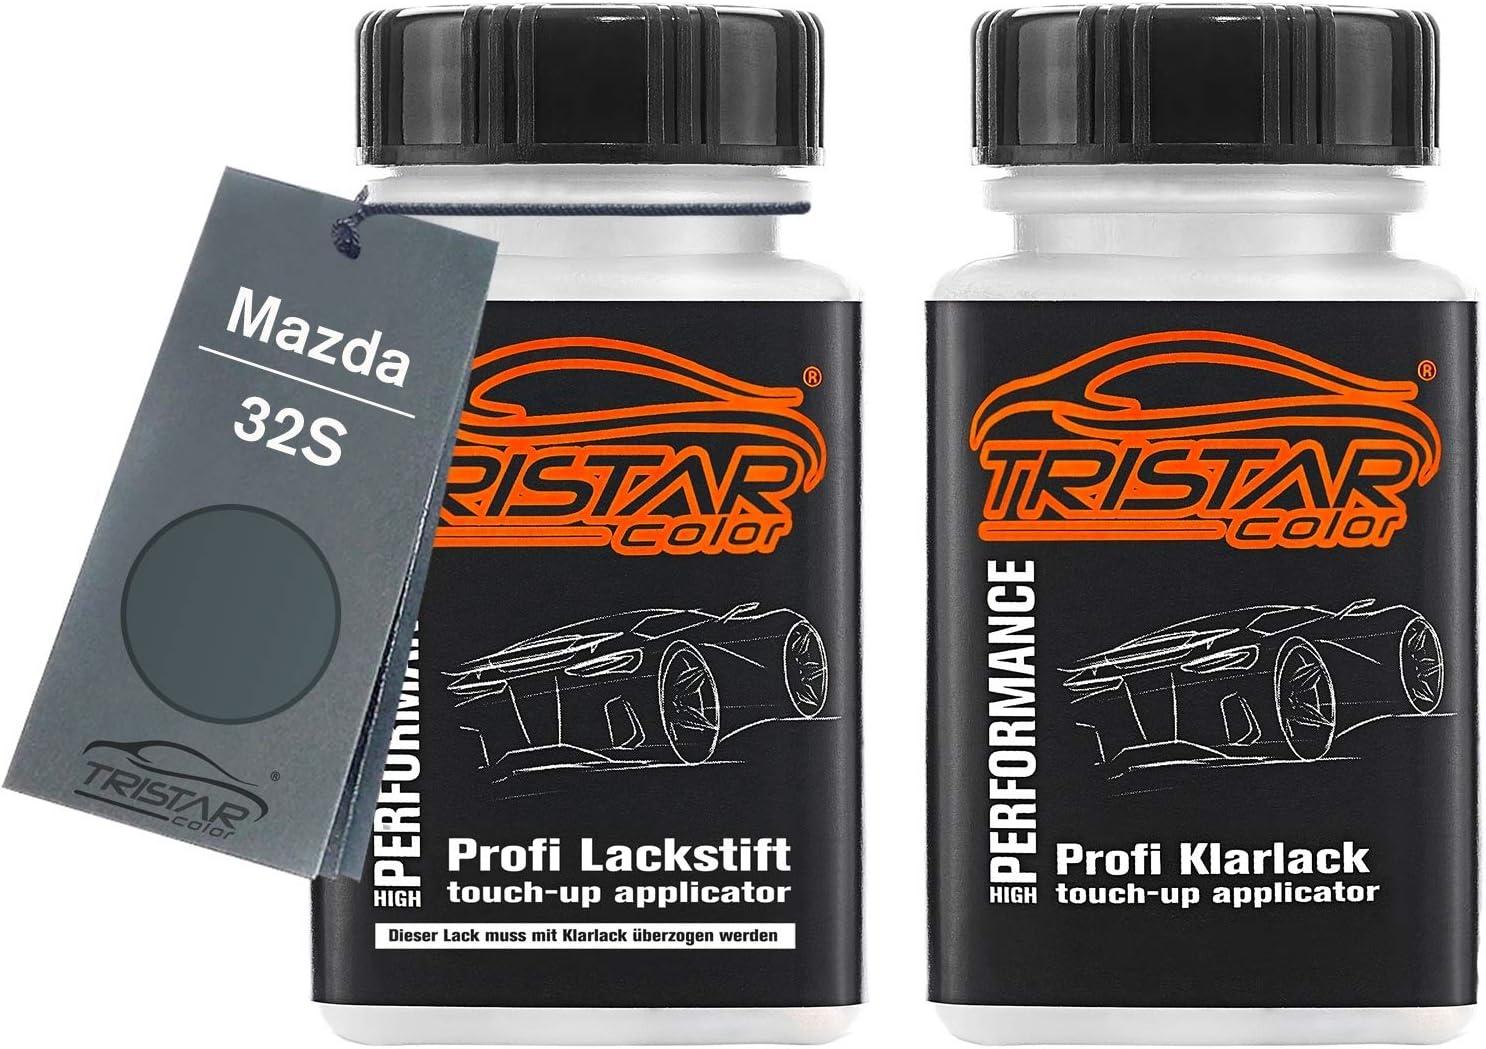 Tristarcolor Autolack Lackstift Set Für Mazda 32s Galaxy Grey Perl Mephistograu Metallic Basislack Klarlack Je 50ml Auto